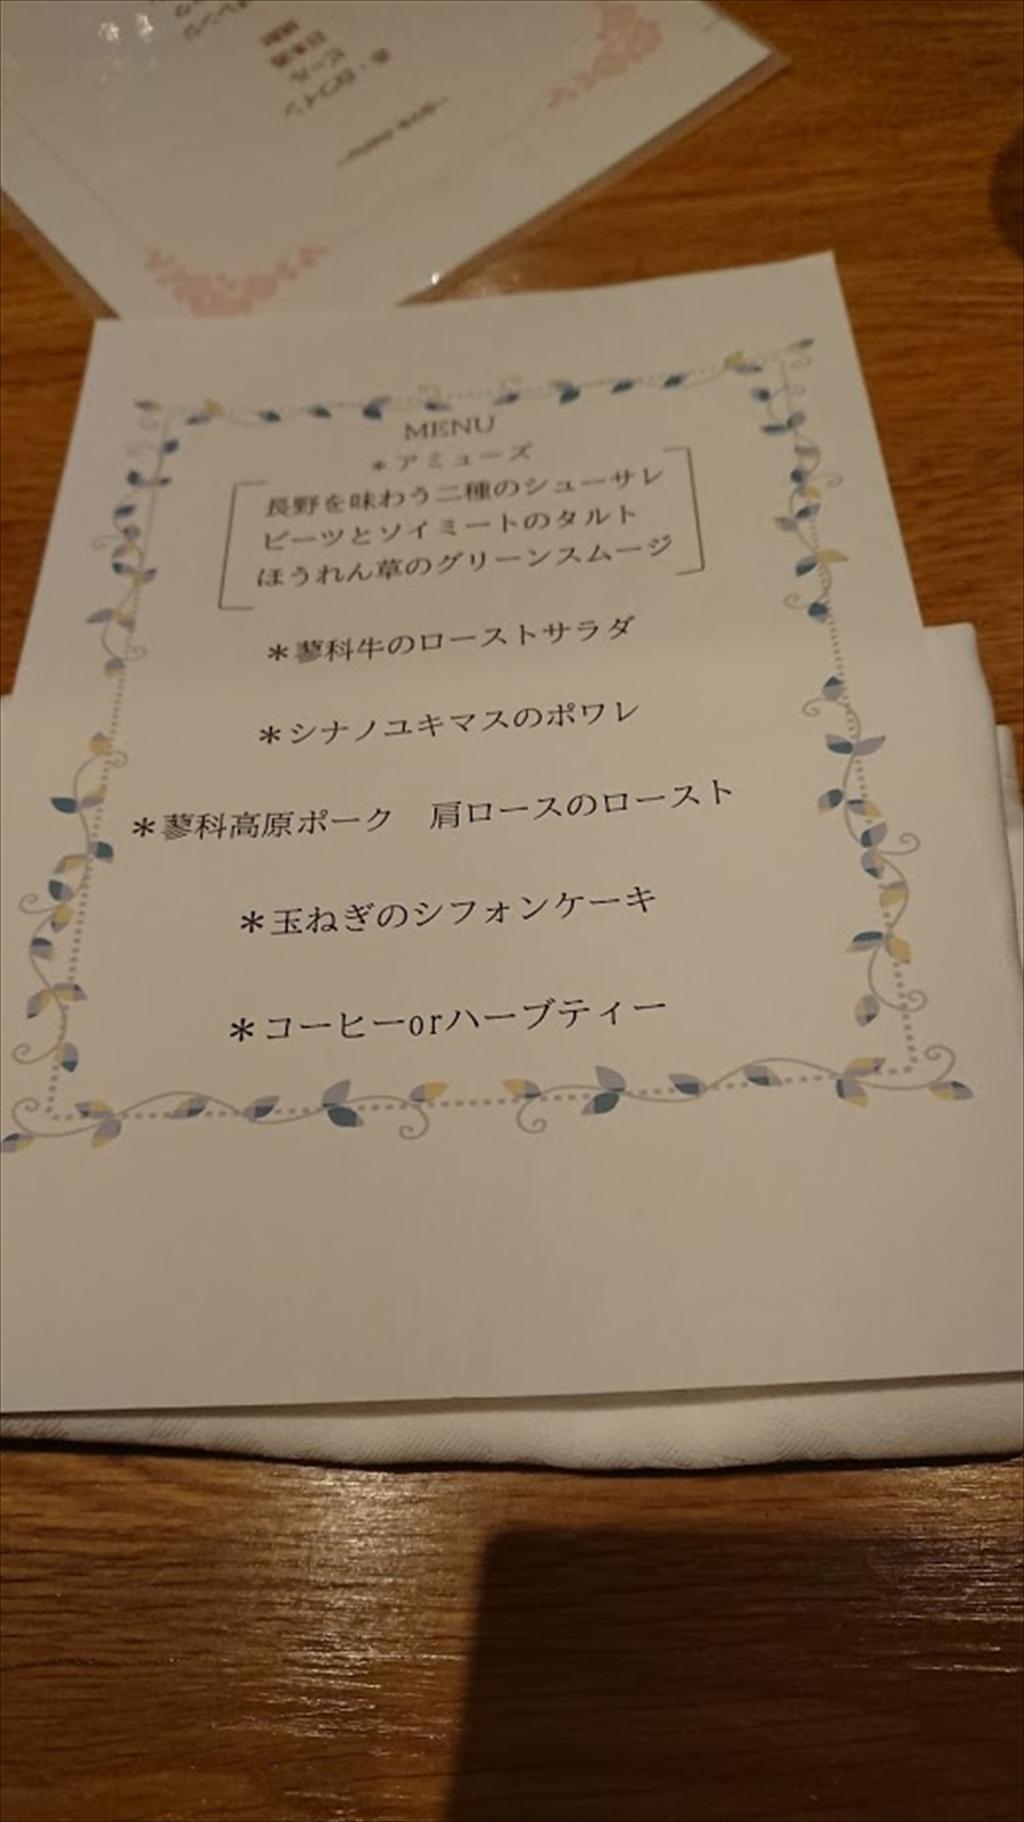 https://hayashida.jp/o/images2019-/DSC_1515_R.JPG